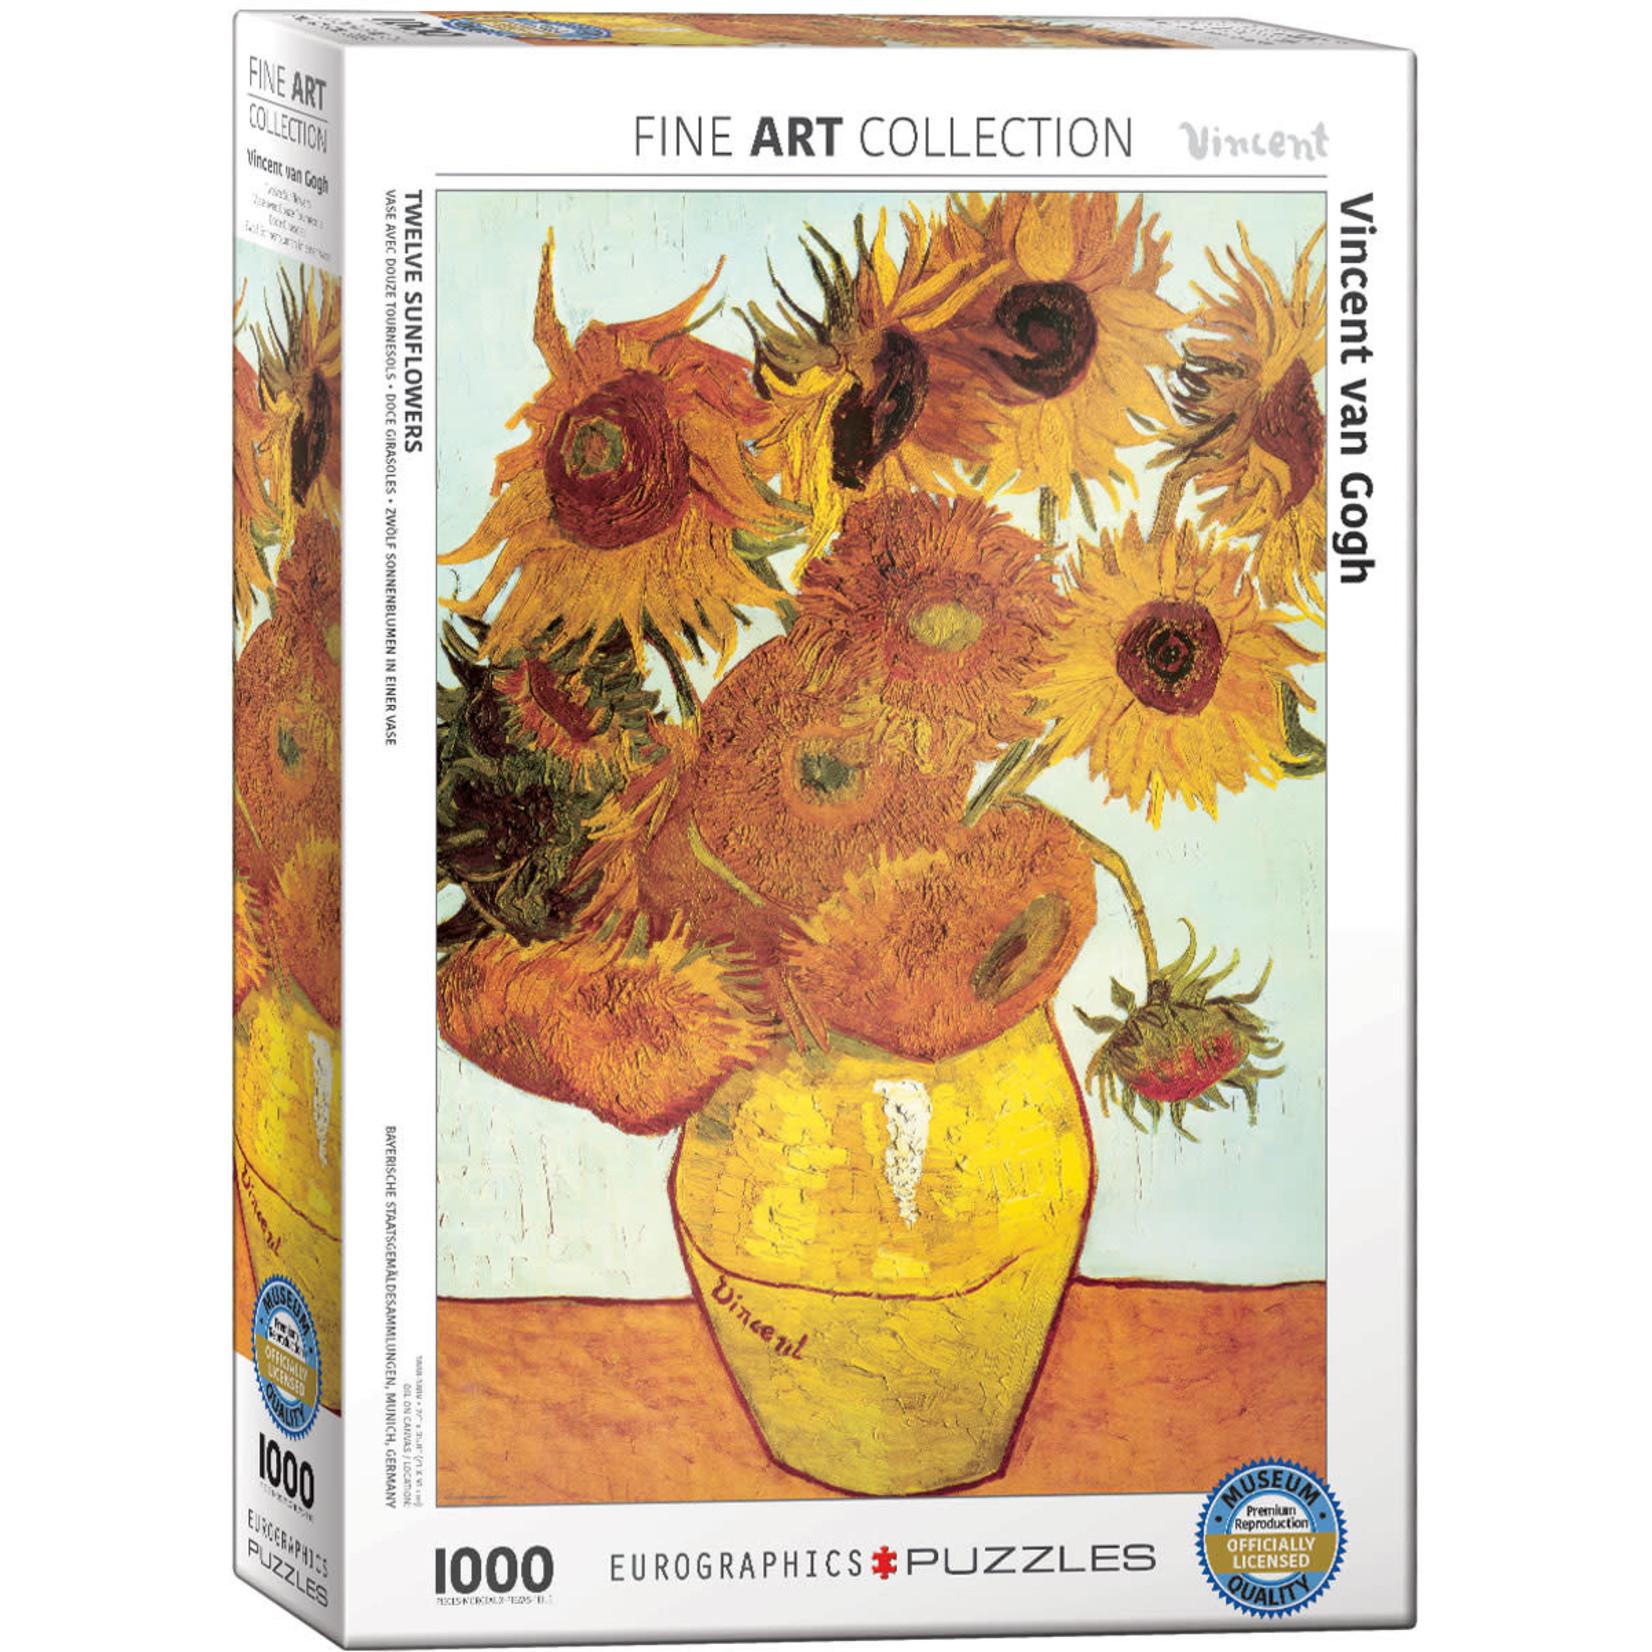 Eurographics Eurographics Puzzle: Twelve Sunflowers by van Gogh - 1000pc